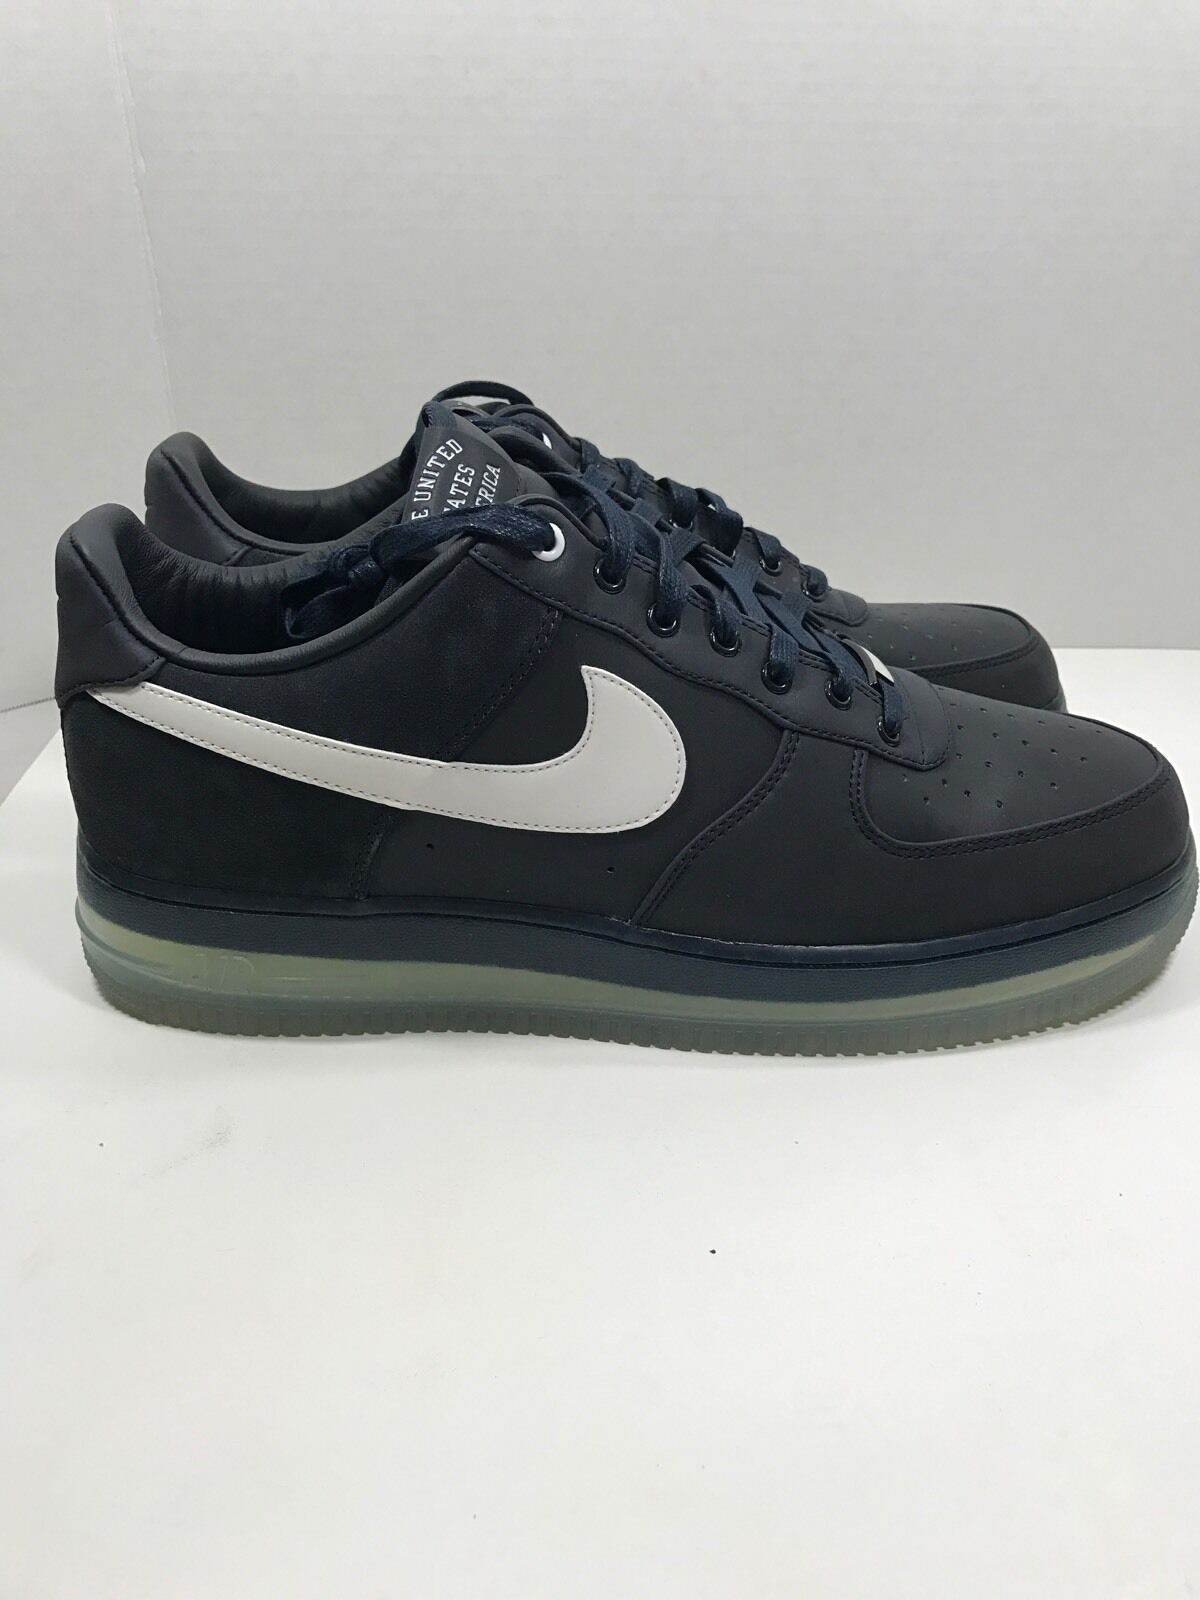 Nike Air Force 1 usa Low Max Air NRG usa 1 Olympics Medal stand reducción de precios baratos zapatos de mujer zapatos de mujer 27231f